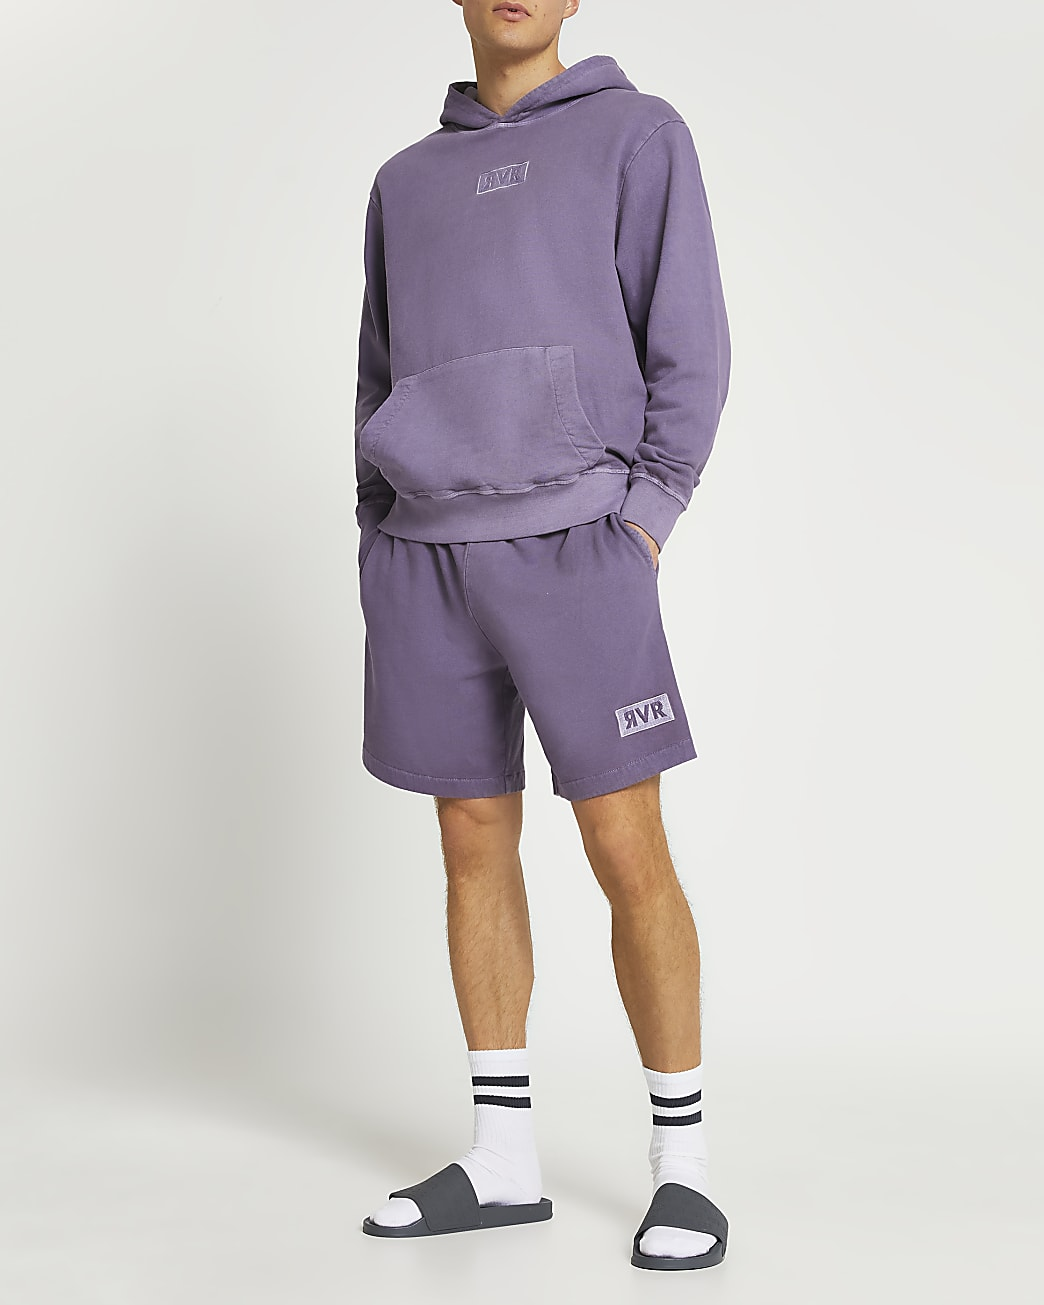 Purple drench RVR shorts